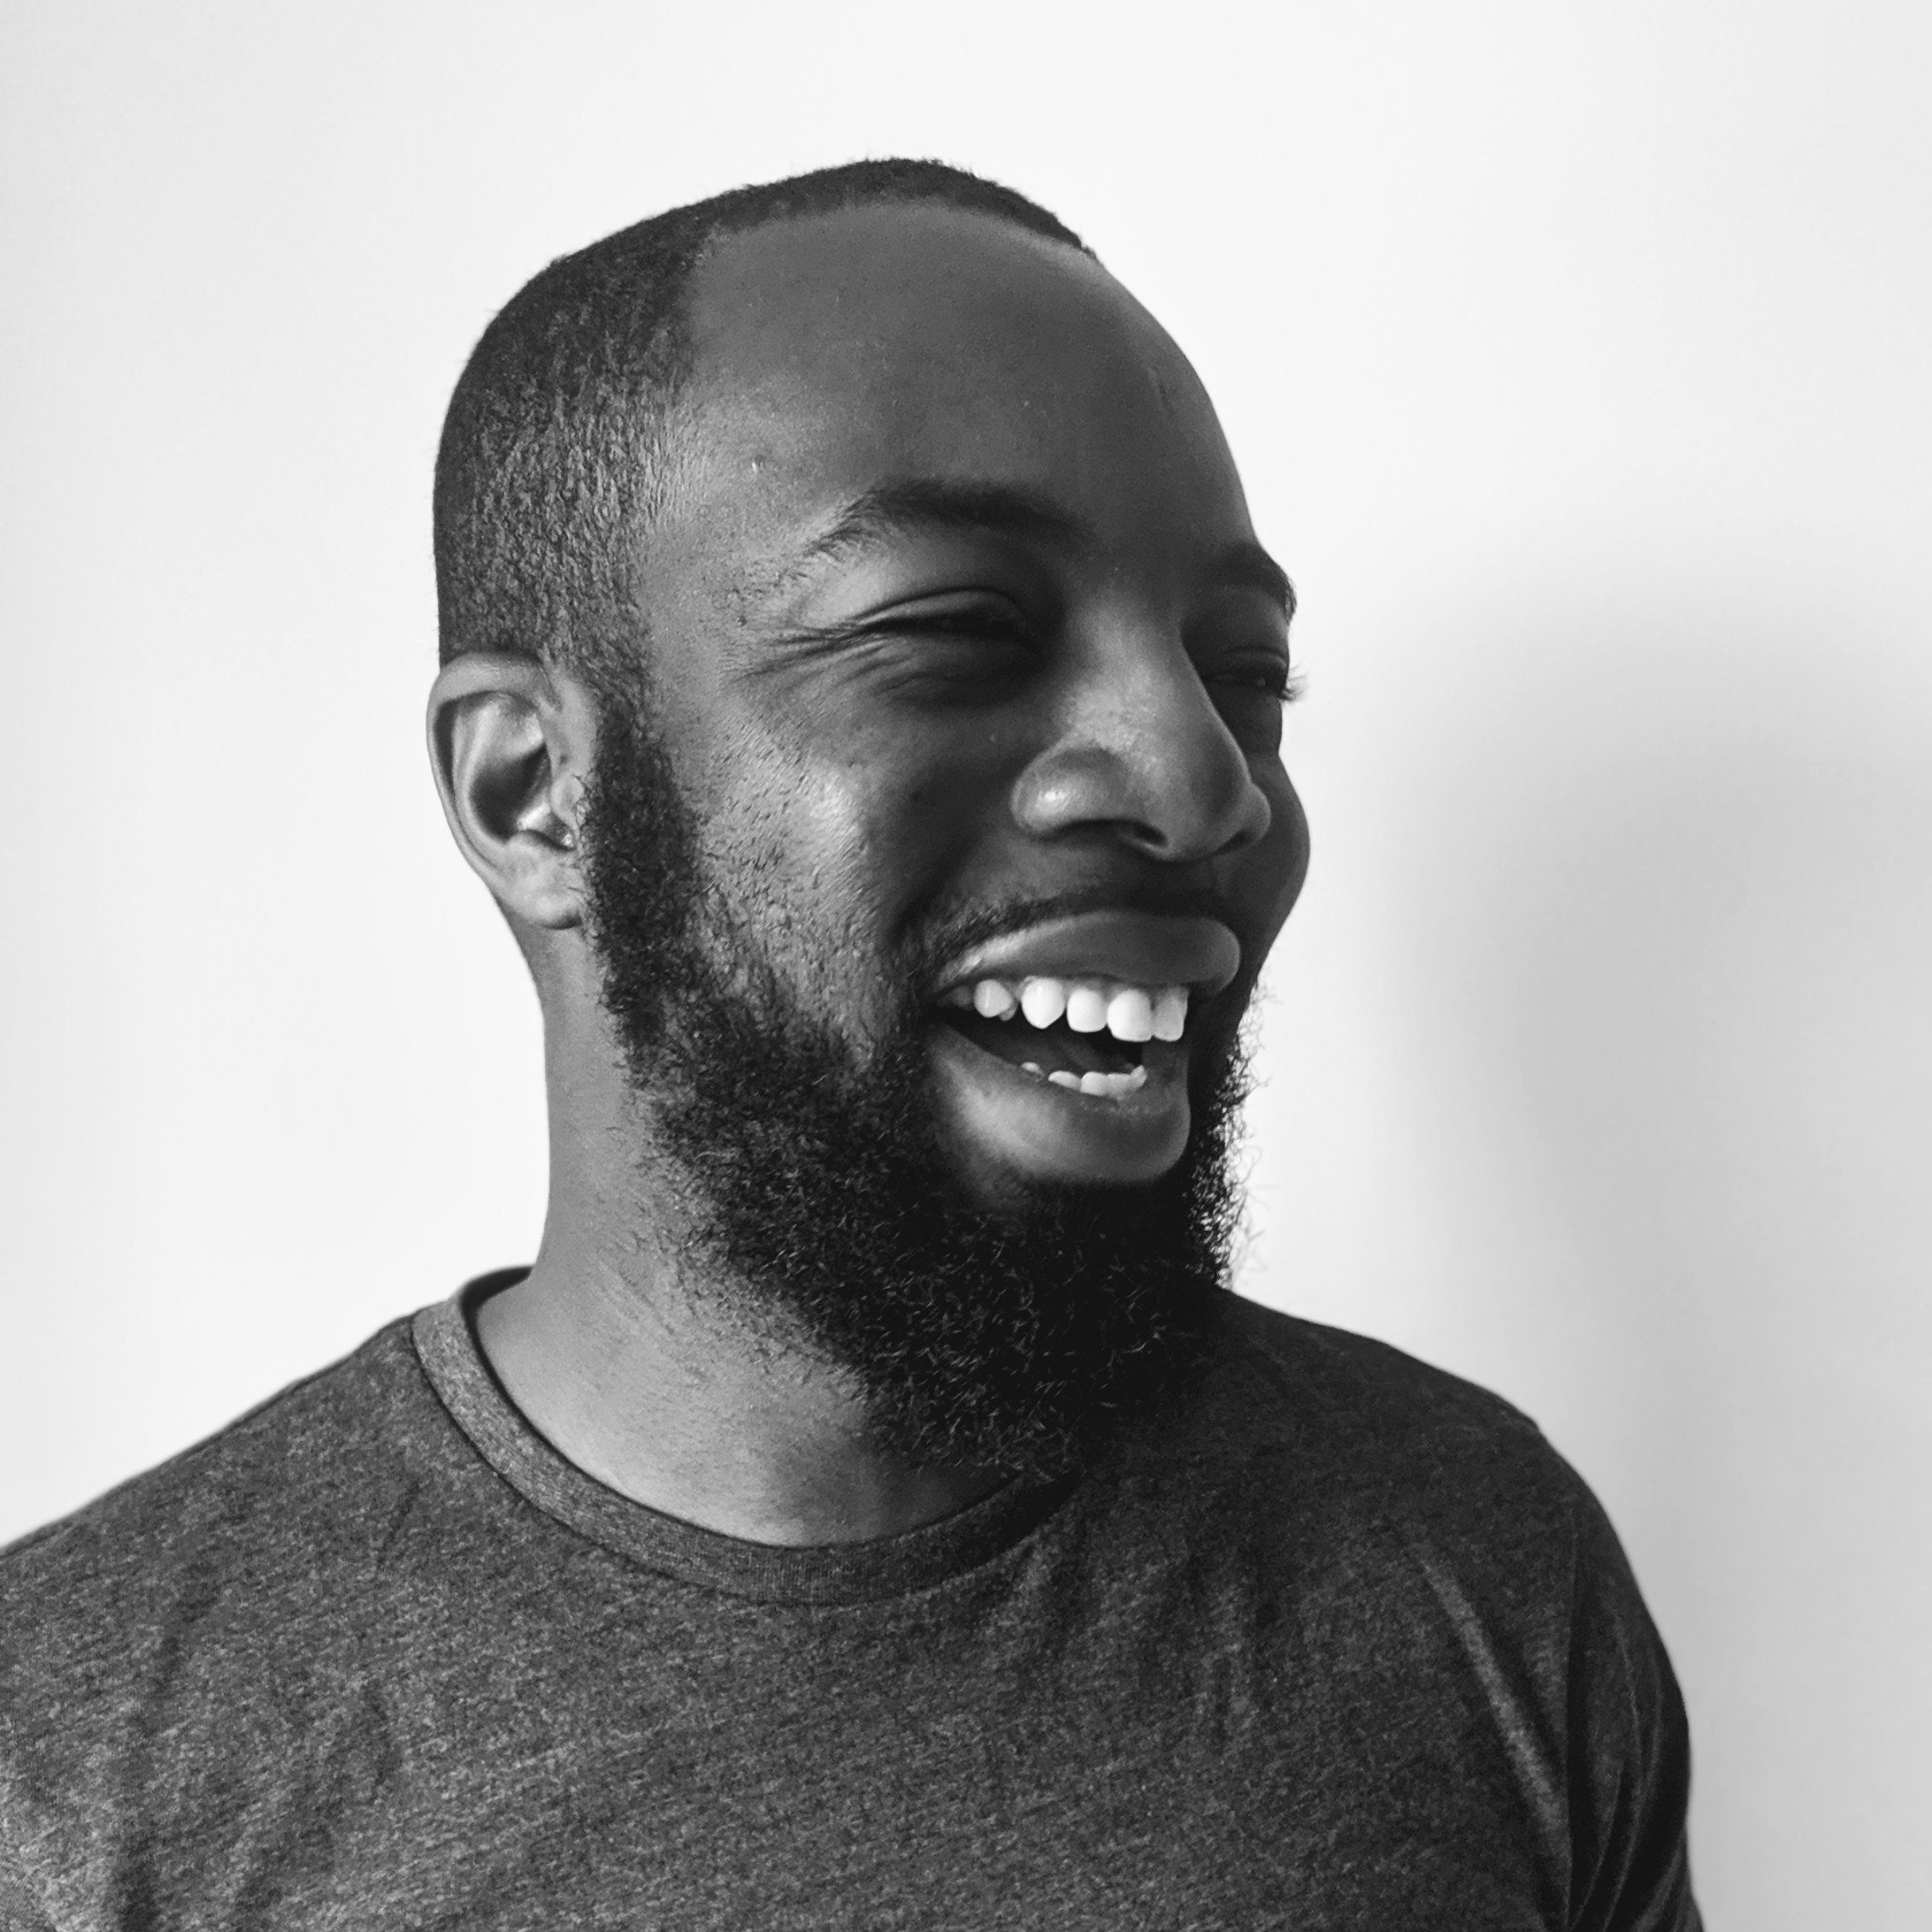 Photo of Kelvin from Breaking Free Design